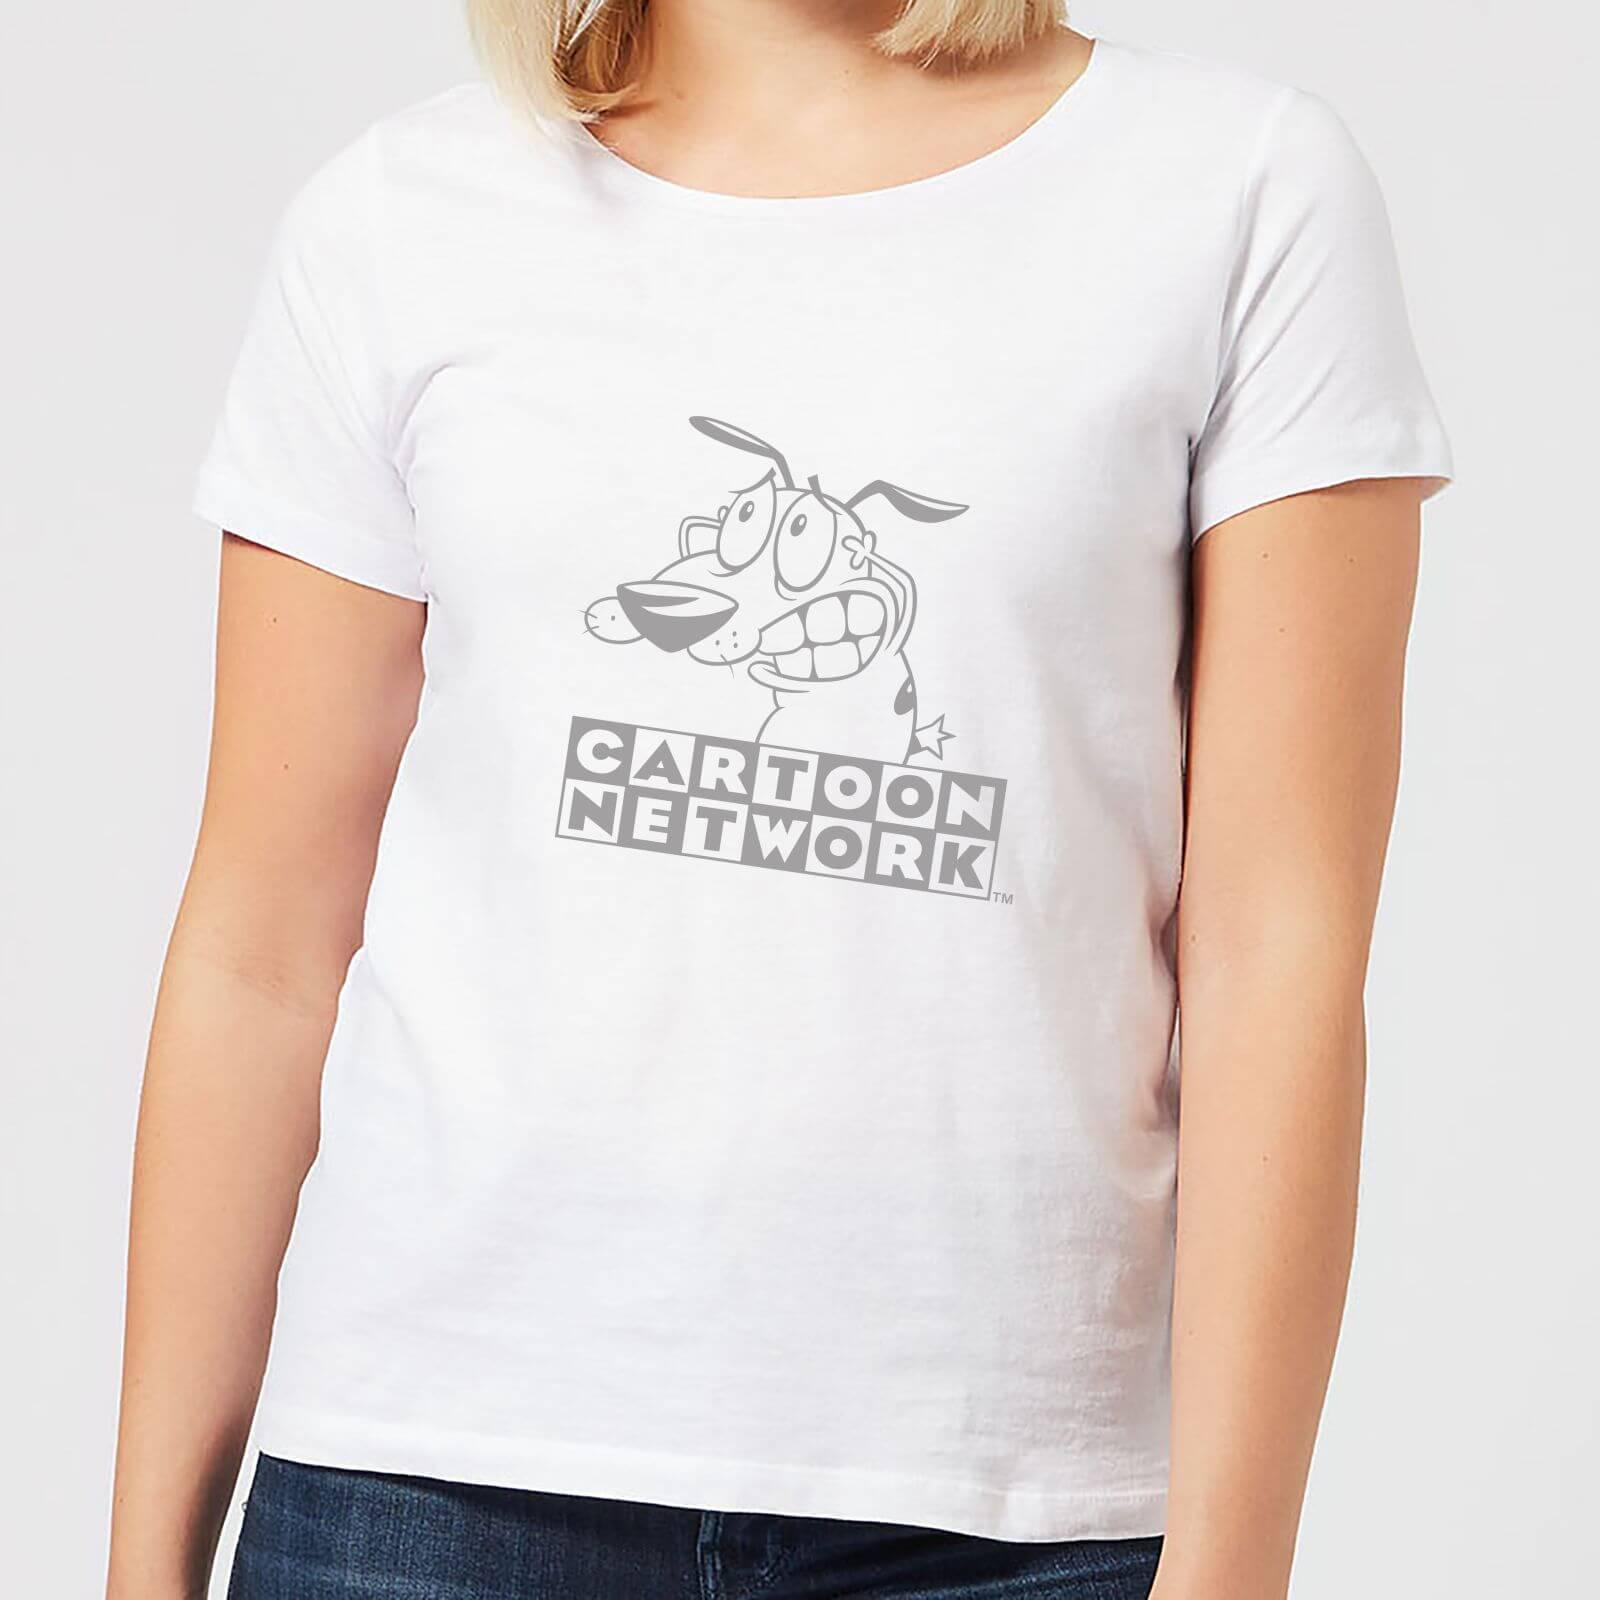 Cartoon Network Courage The Cowardly Dog Outline Women's T-Shirt - White - XXL - White